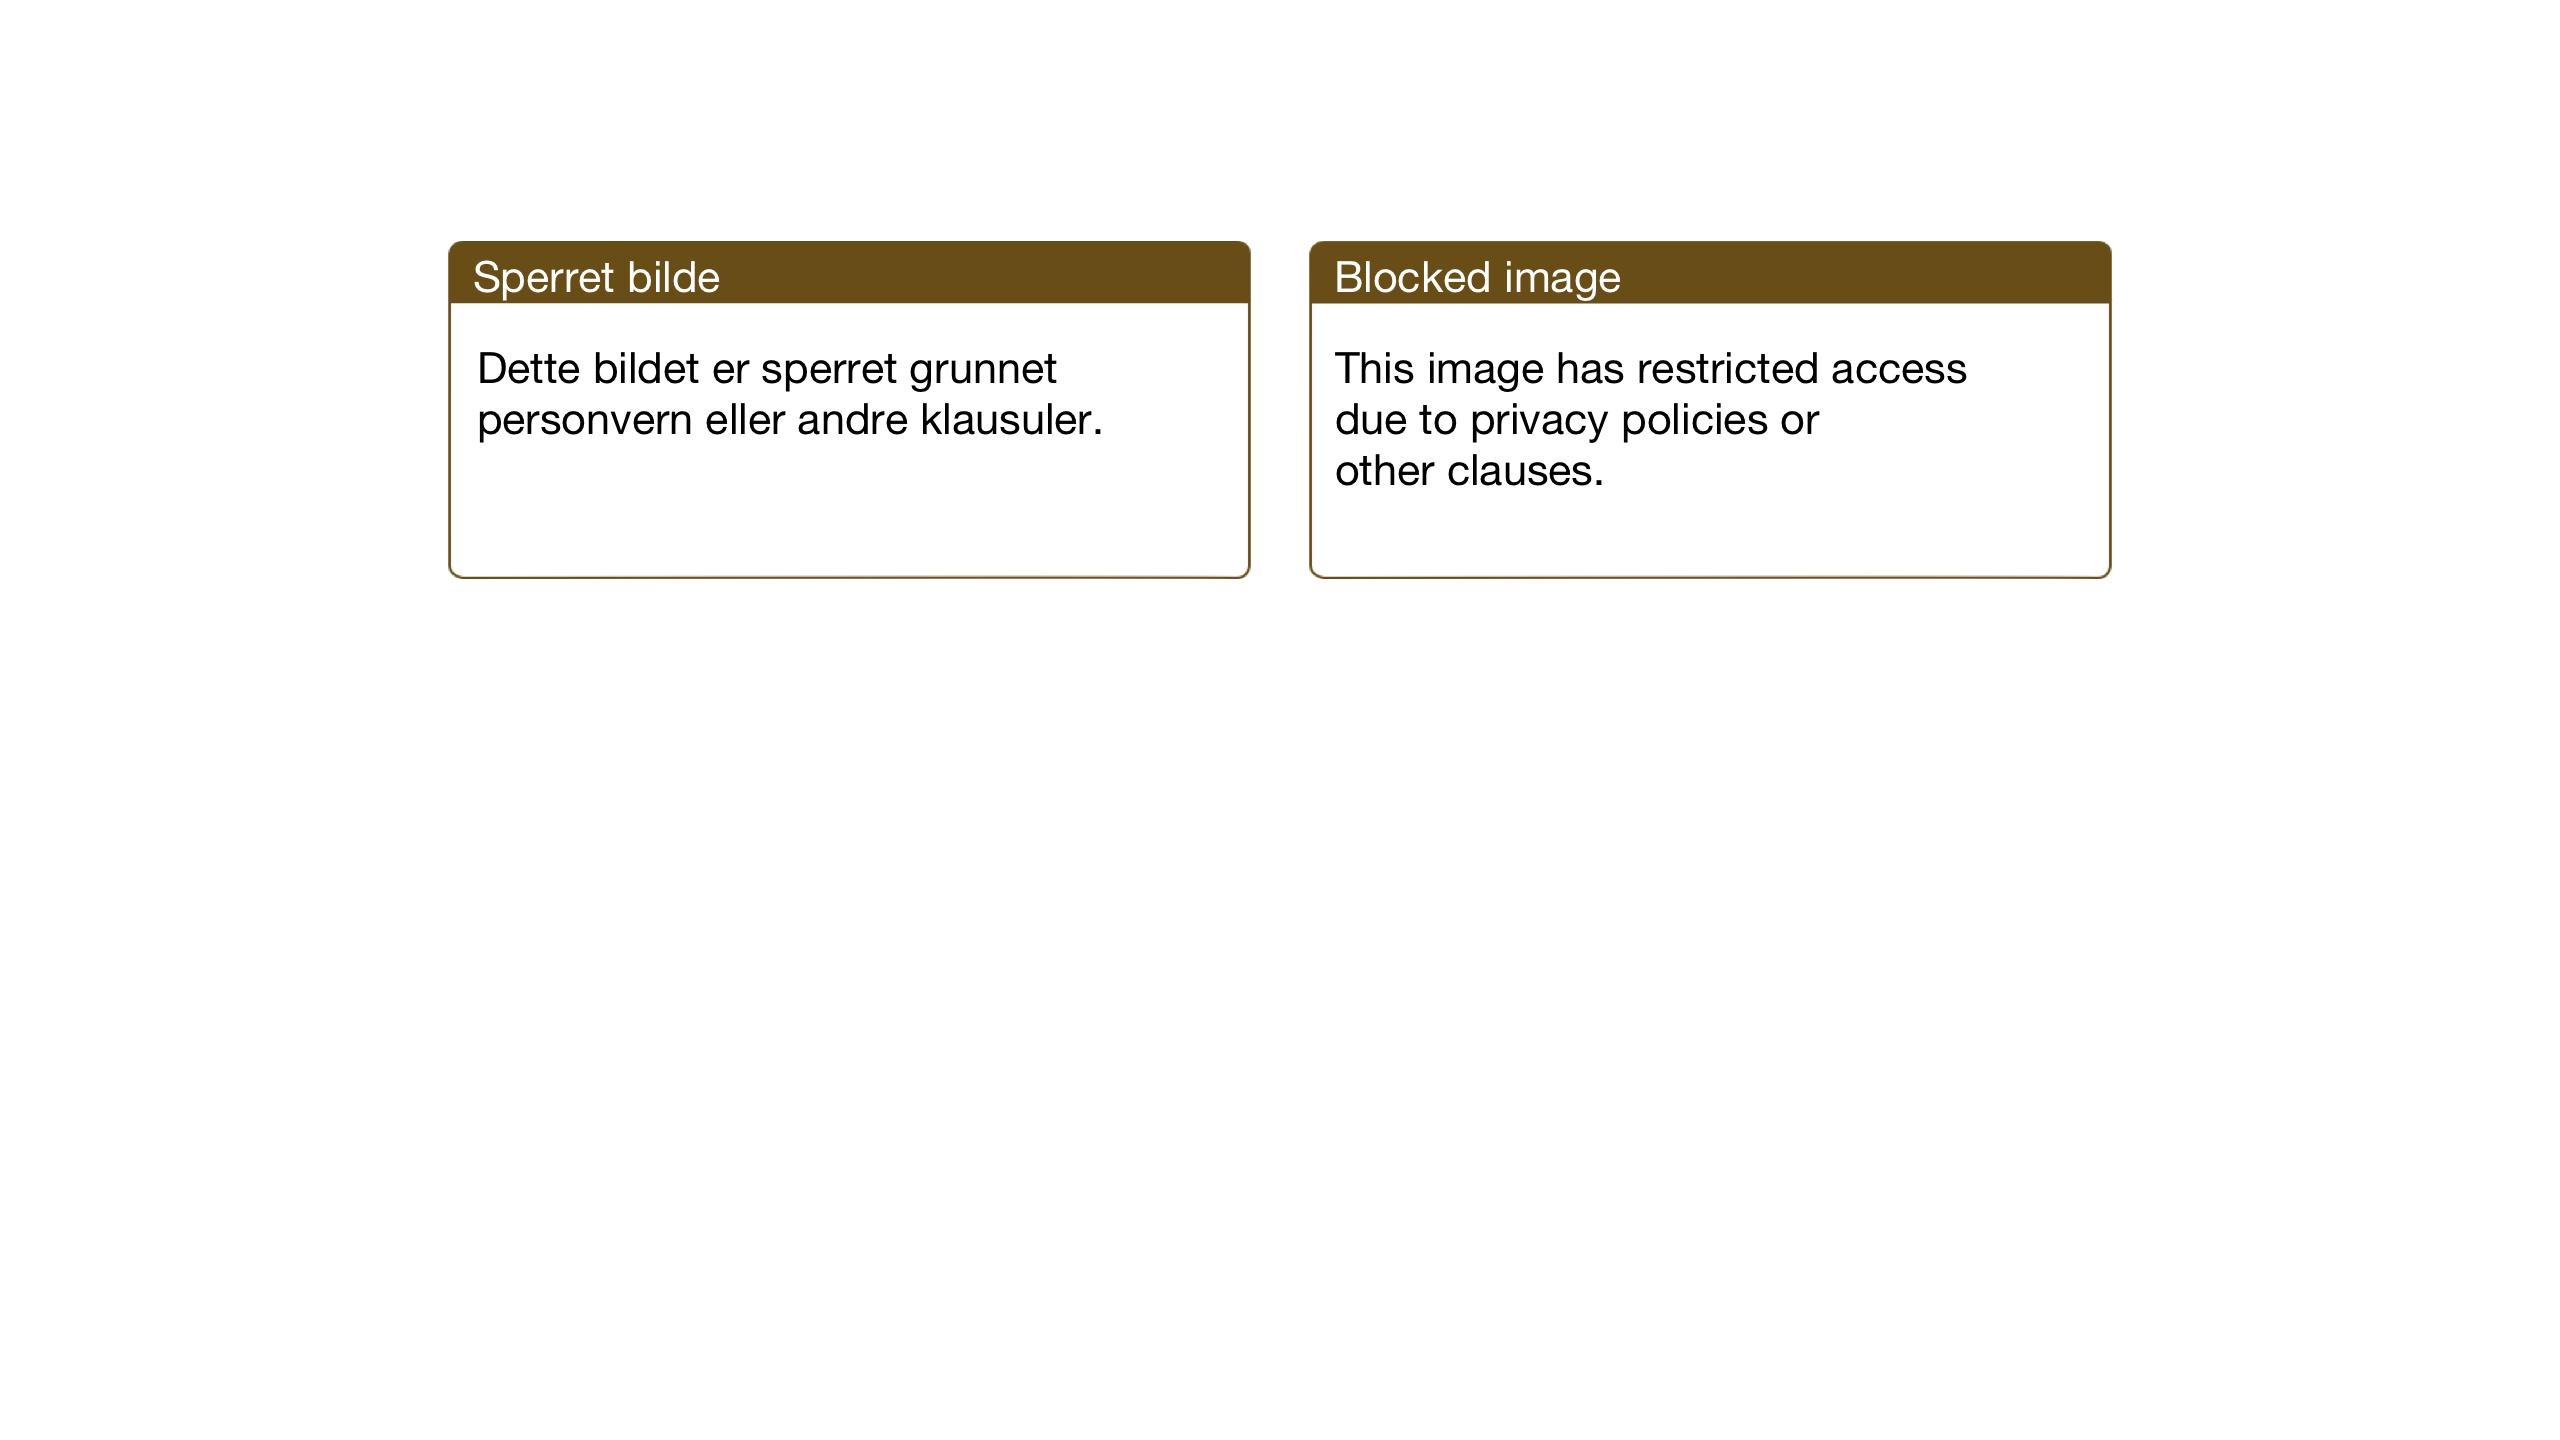 SAT, Ministerialprotokoller, klokkerbøker og fødselsregistre - Nordland, 847/L0680: Klokkerbok nr. 847C08, 1930-1947, s. 80